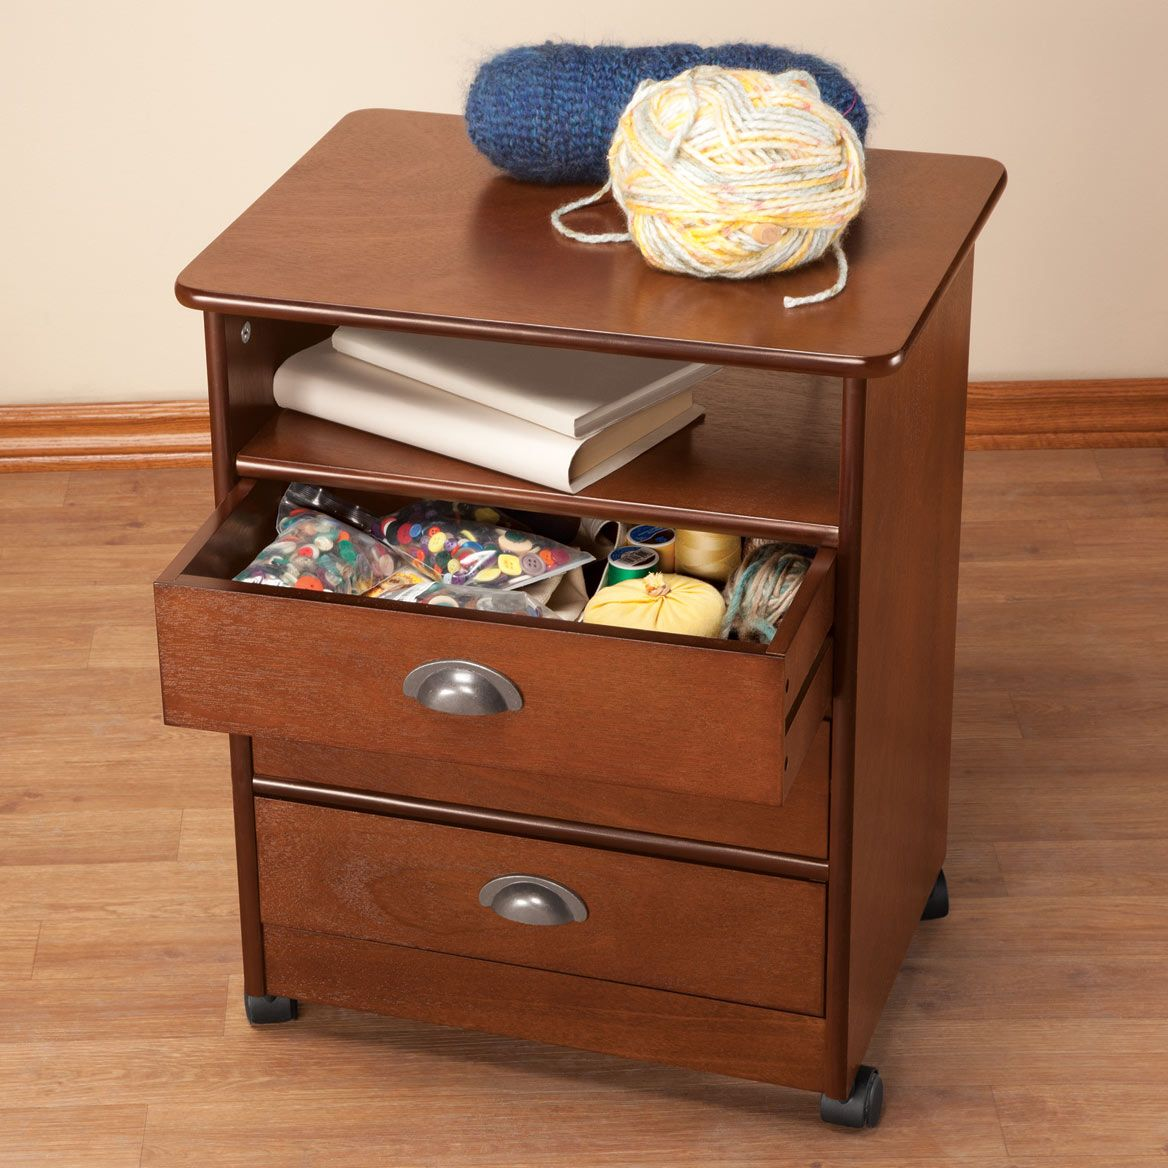 Three Drawer Multipurpose Rolling Cart by OakRidge™  XL-359628